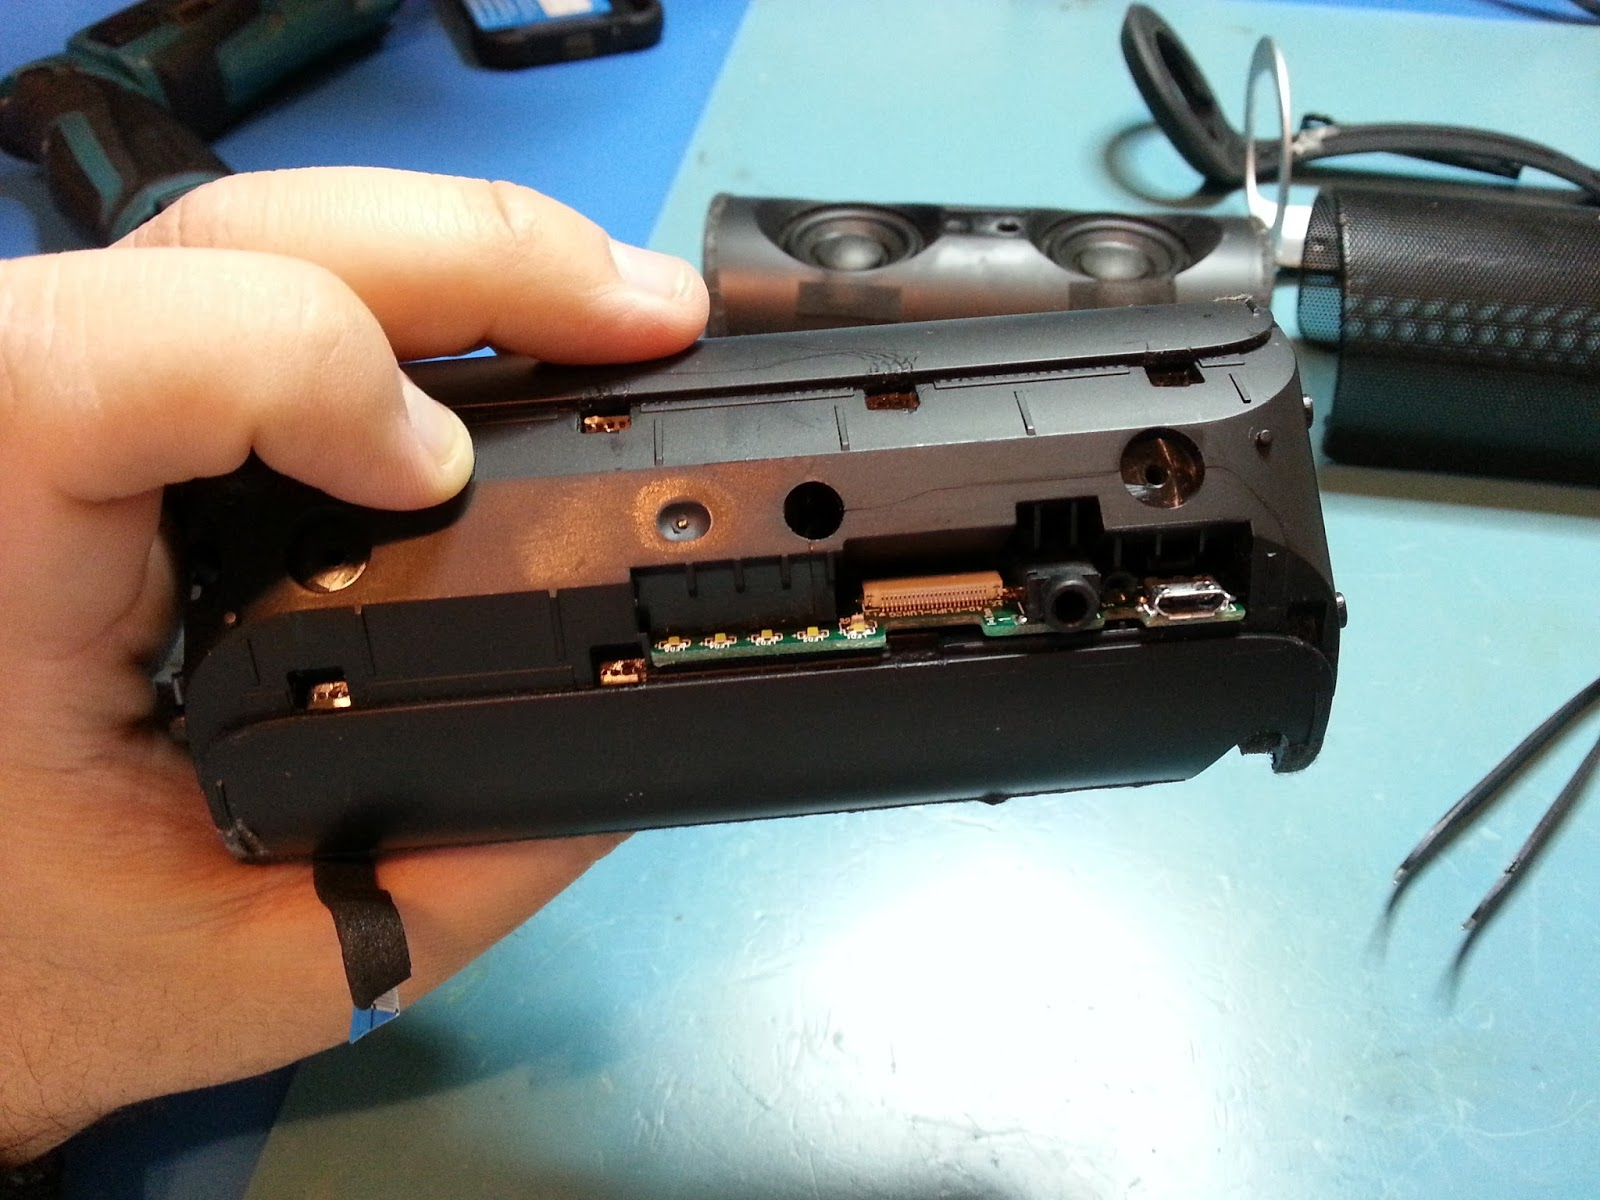 repairs and tech stuff: JBL Flip 2 broken usb charging port